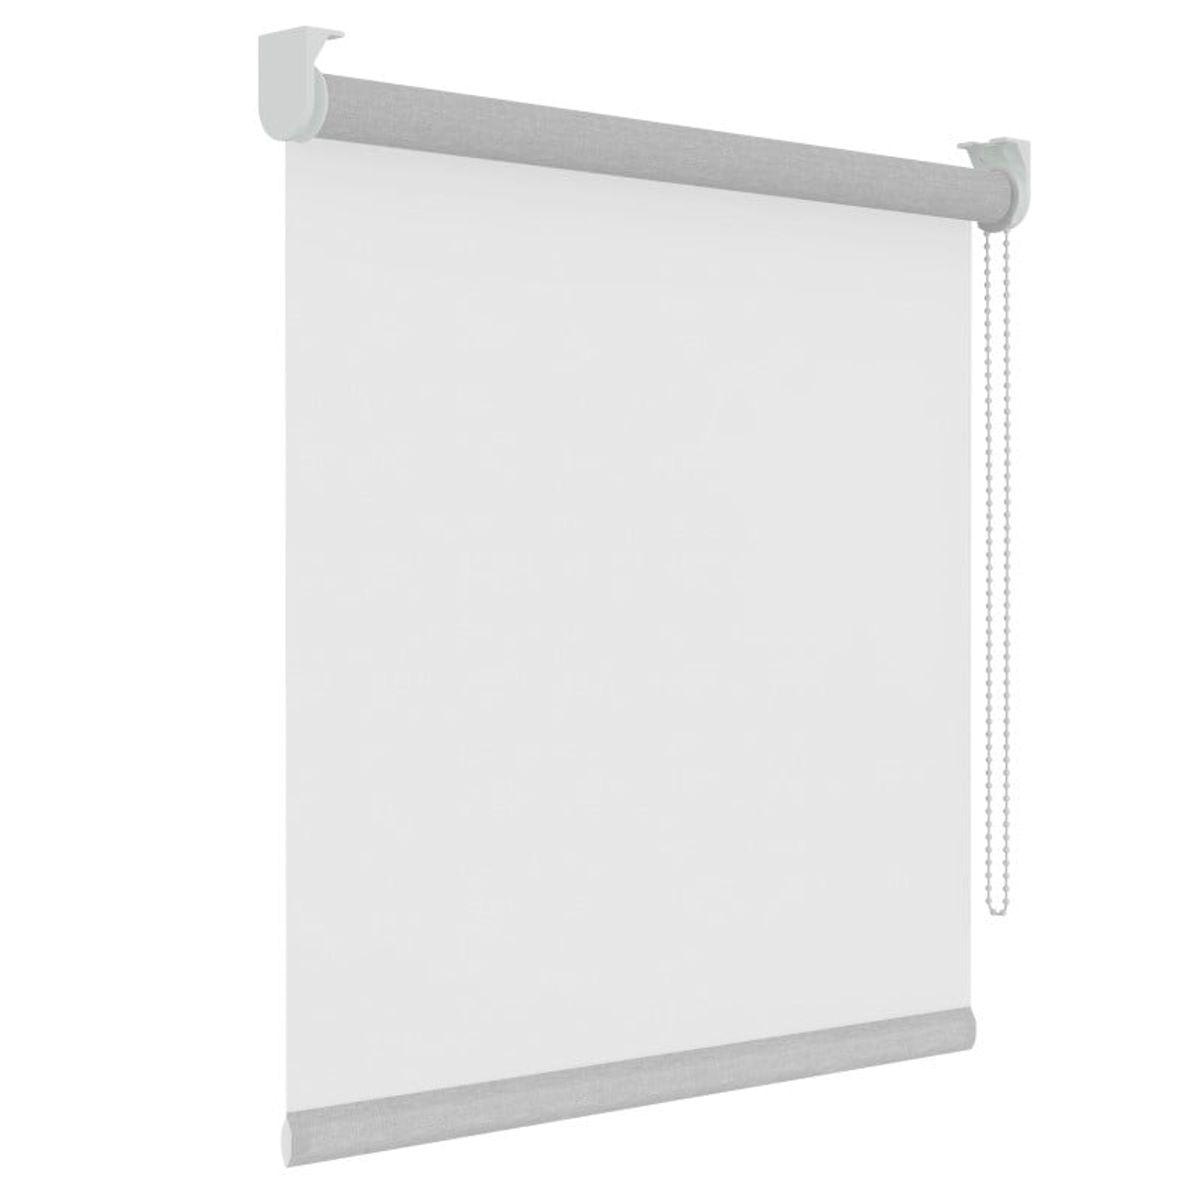 Rolgordijn - Lichtdoorlatend - Transparant Wit - 150cm x 190cm